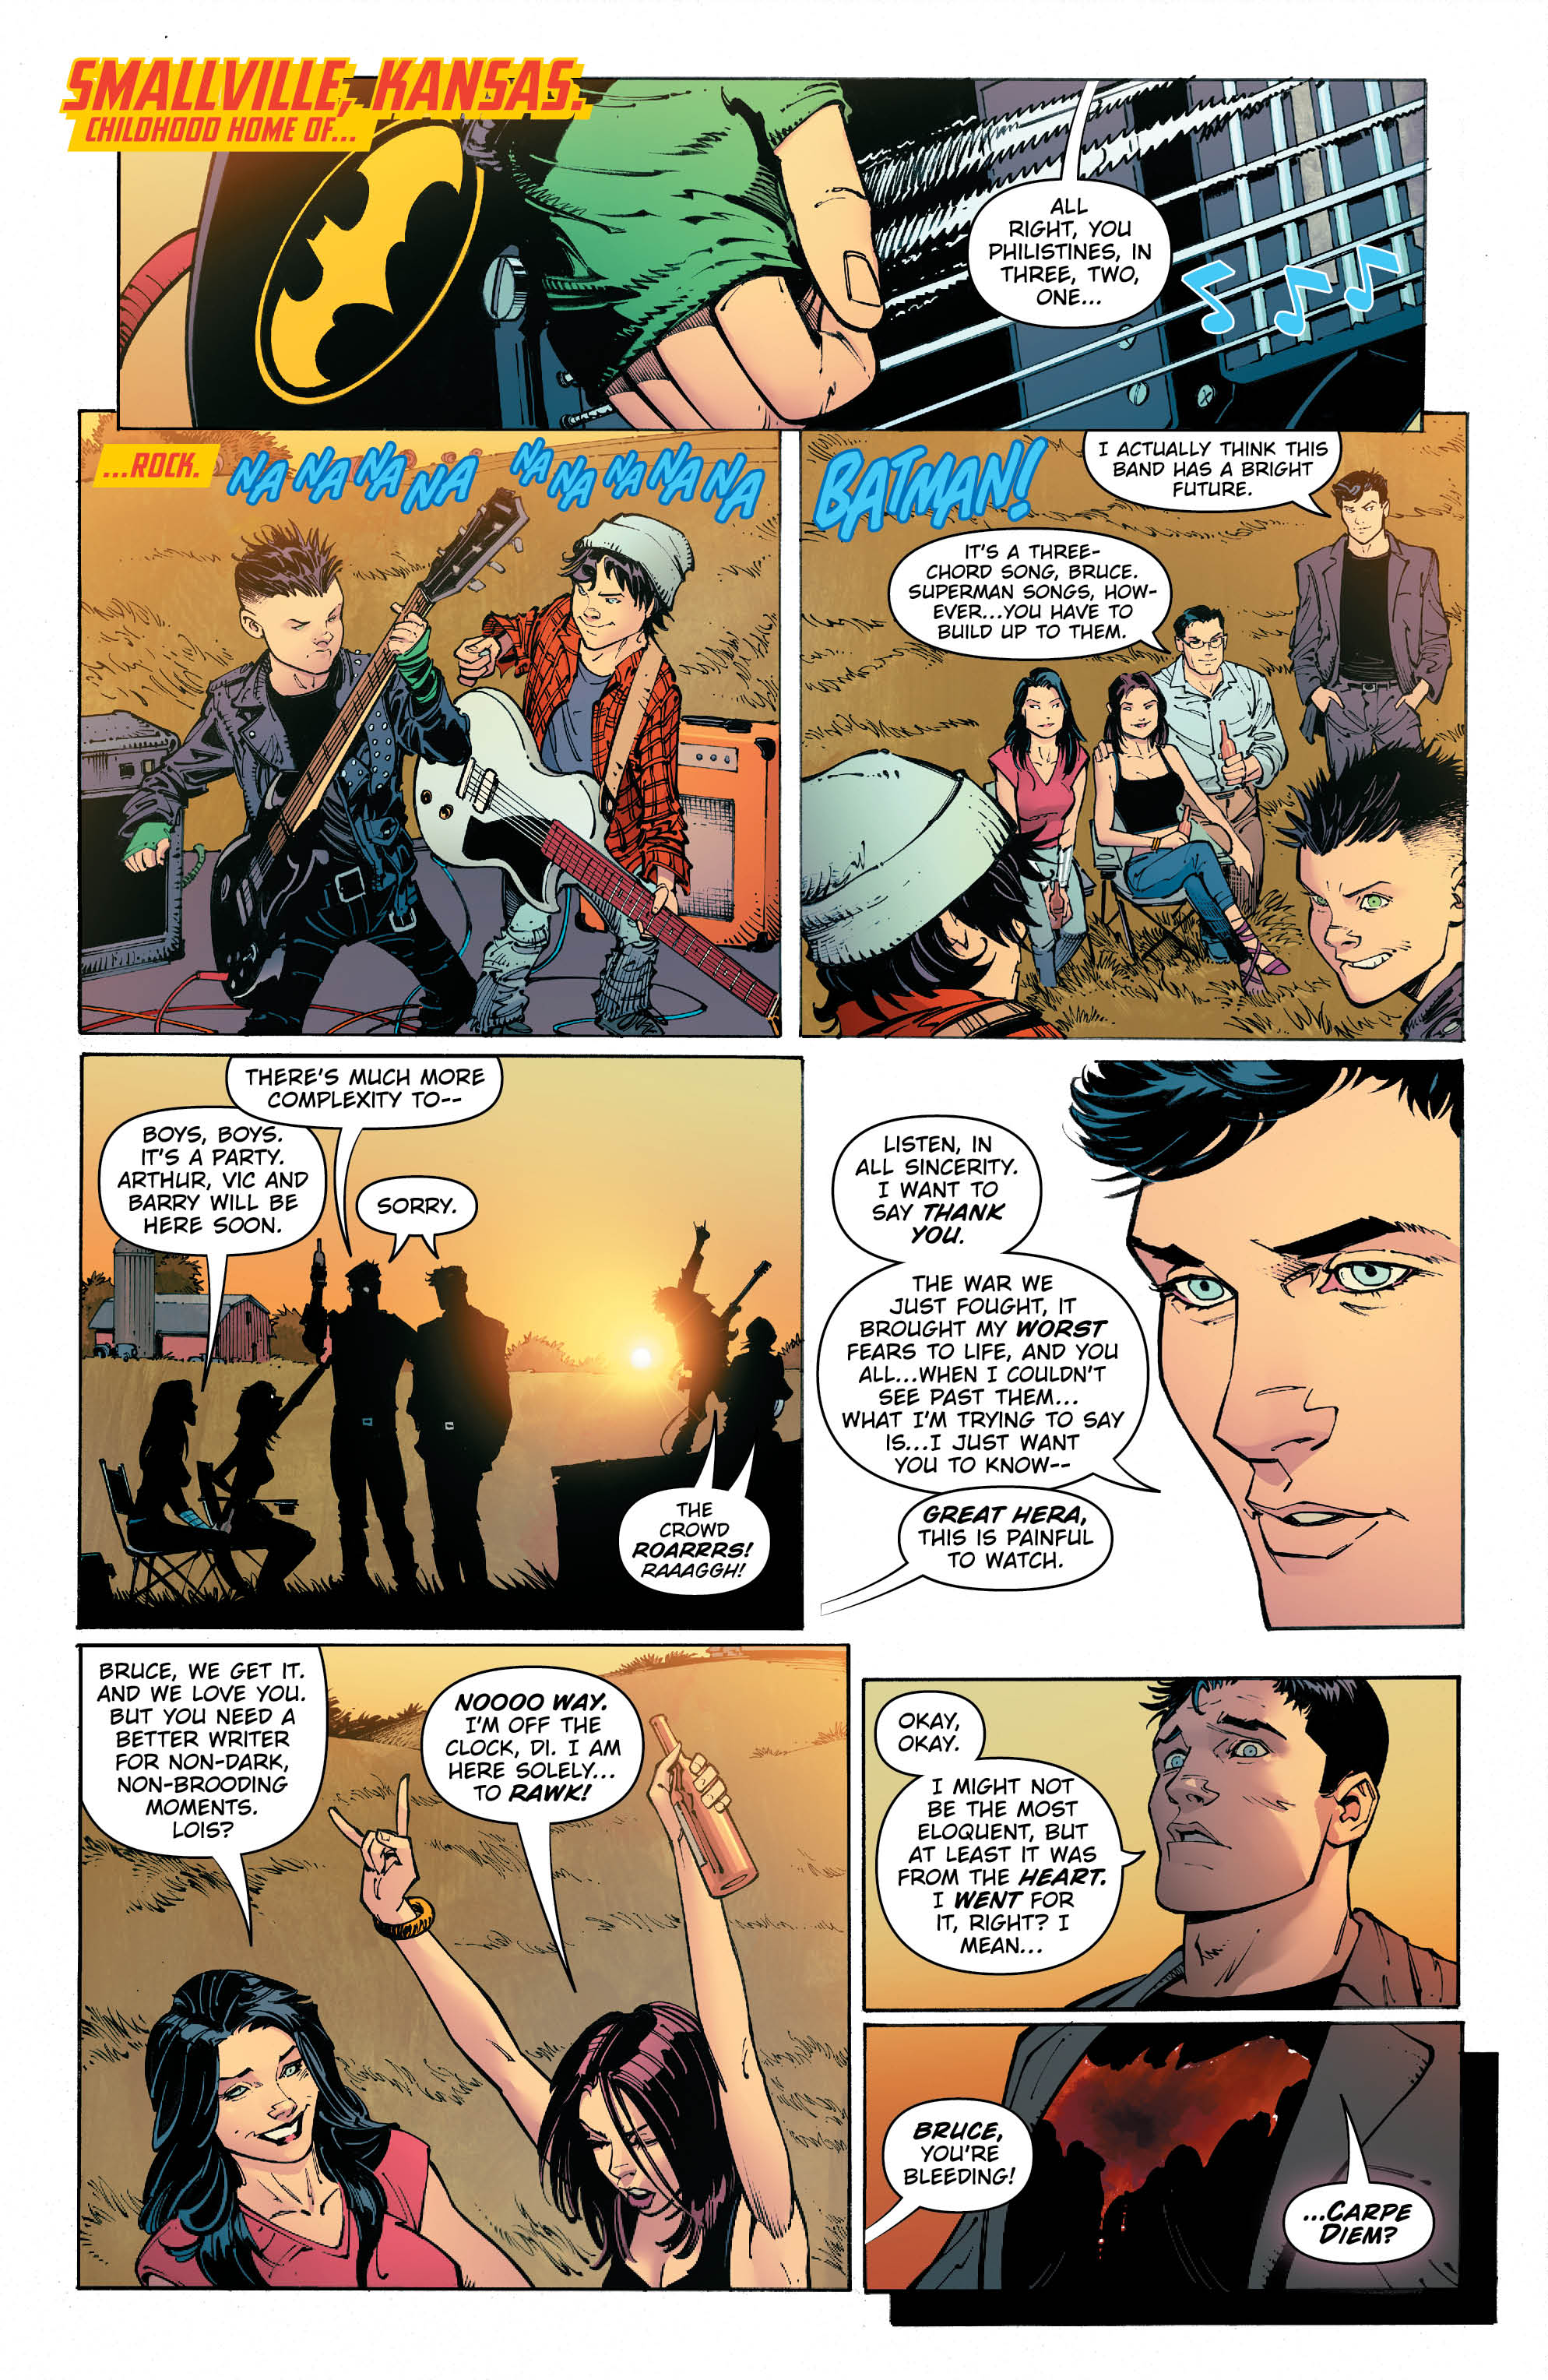 Dark Nights Metal 1 - DC Comics News